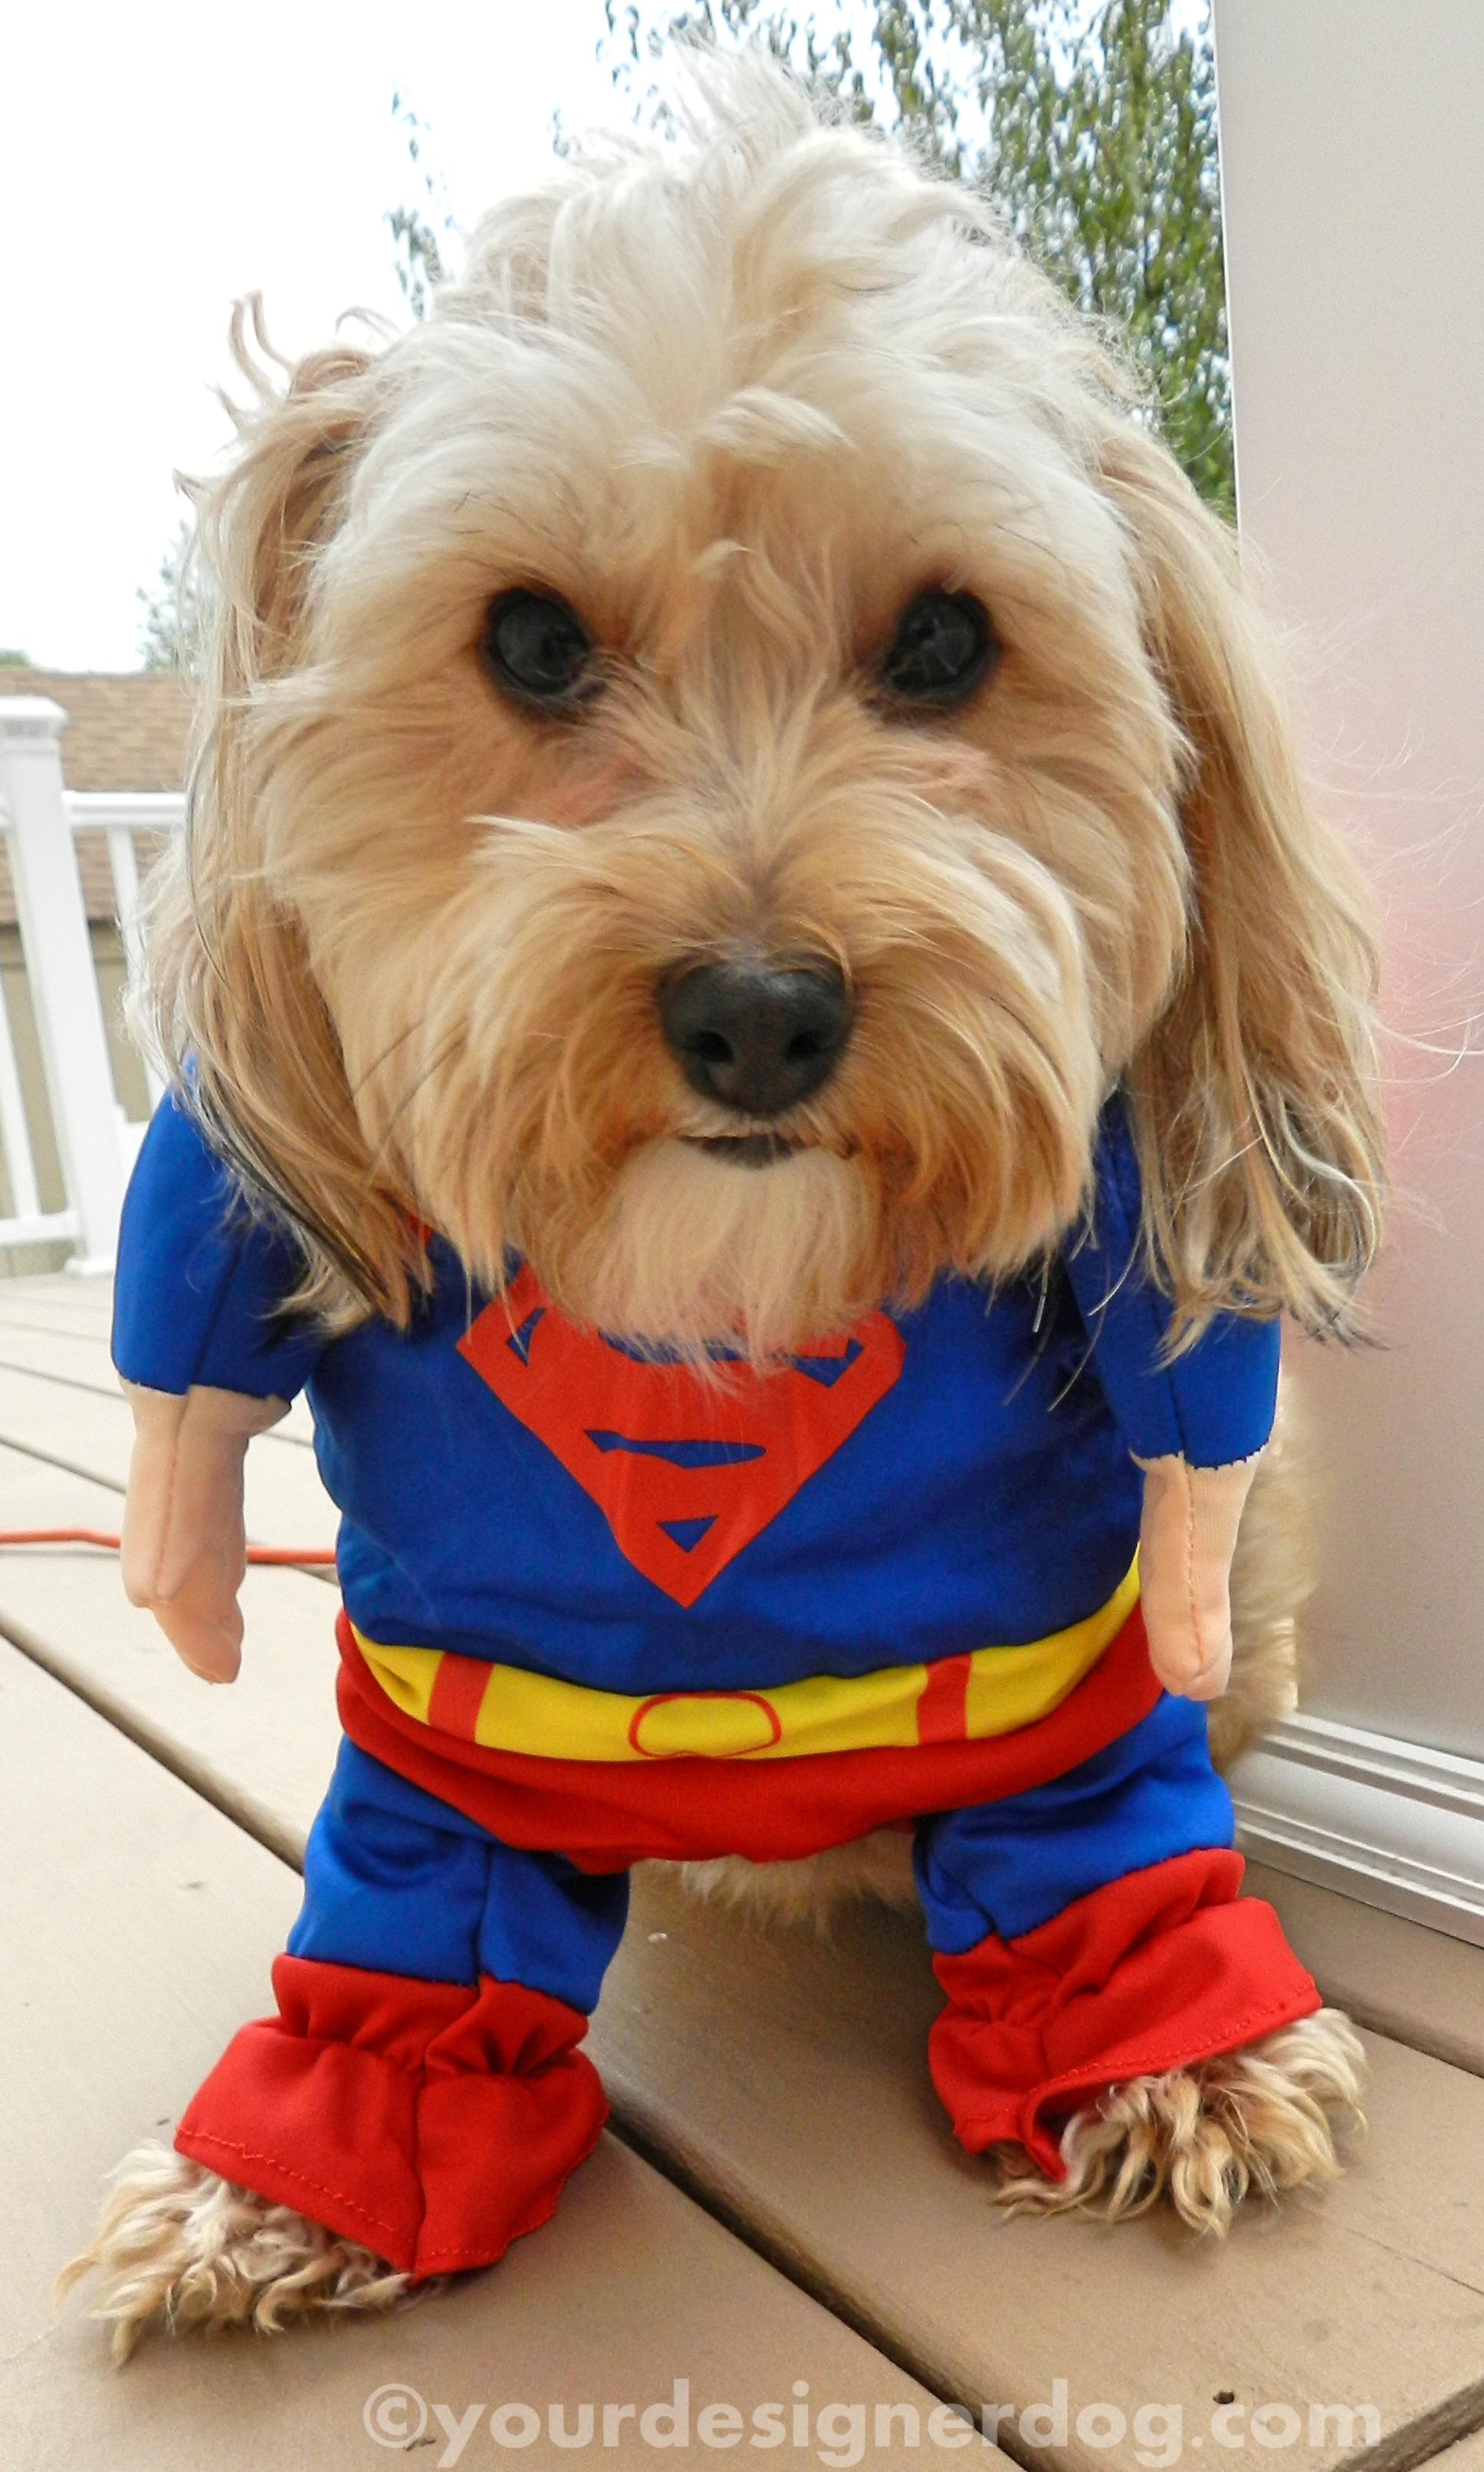 dogs designer dogs yorkipoo yorkie poo superhero halloween dog costume & Halloween Costume Cuteness - YourDesignerDog